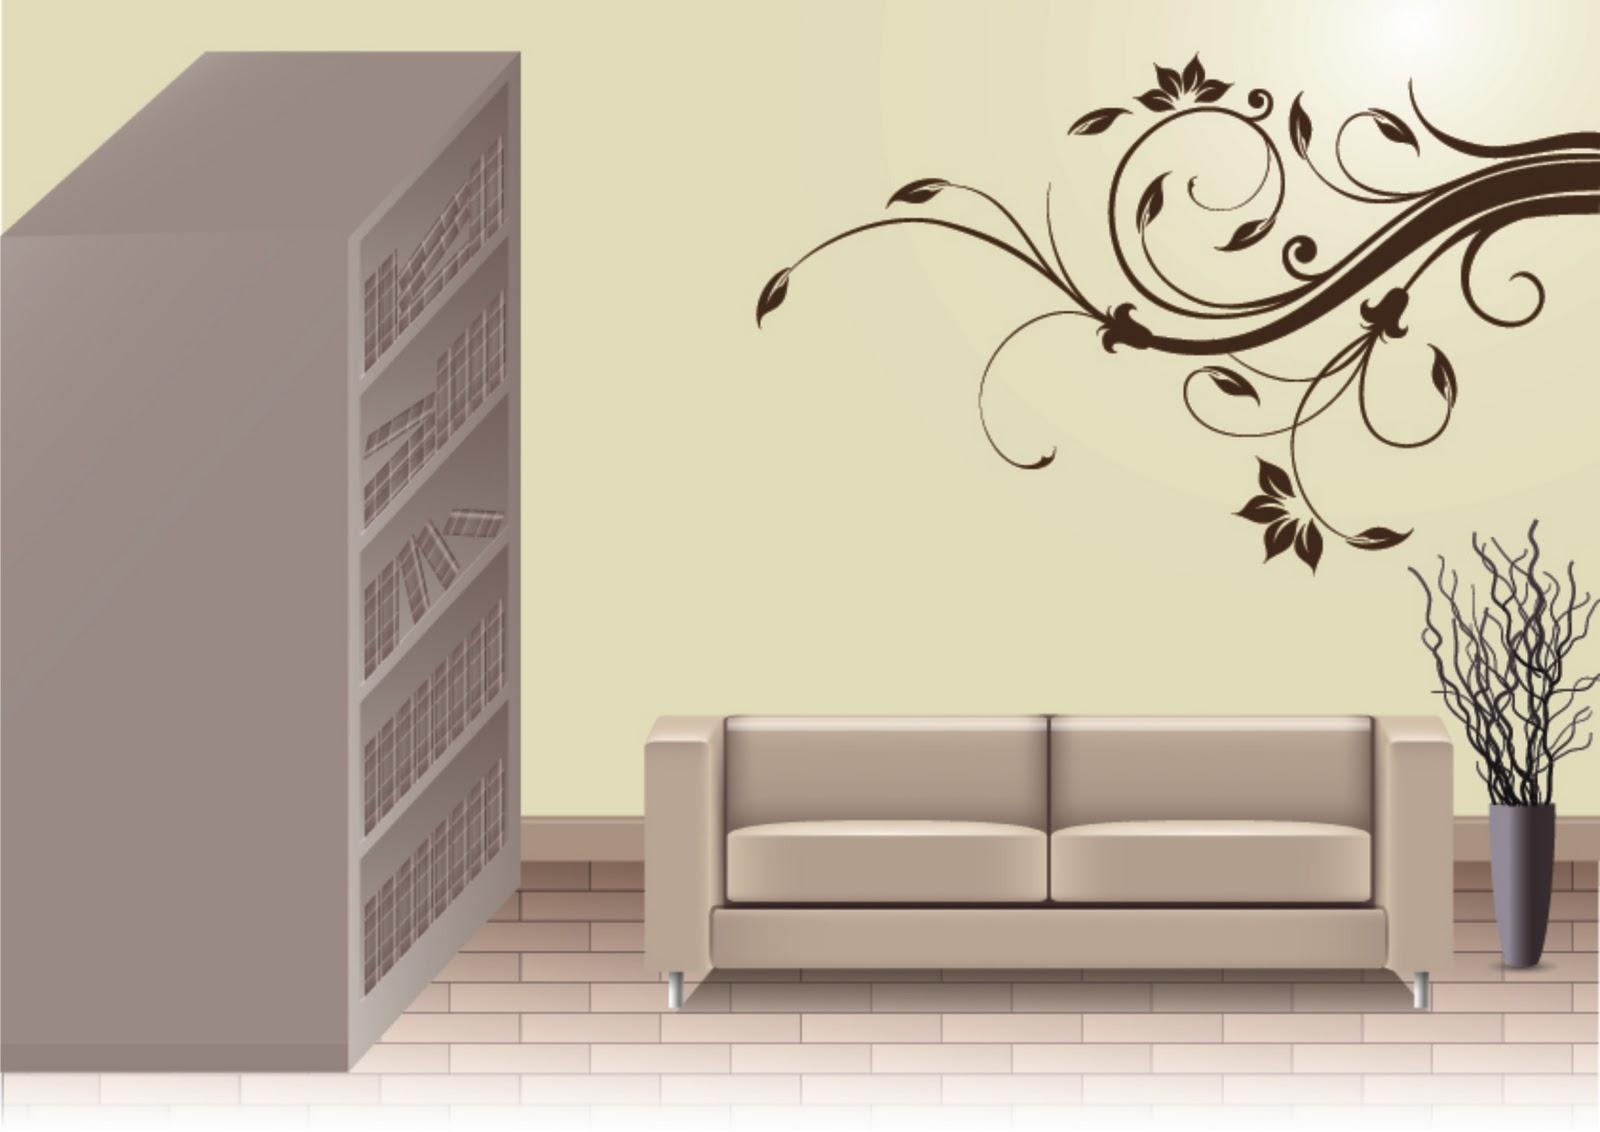 Mvpdesign modelos de vinilos decorativos for Diseno de interiores vinilos decorativos